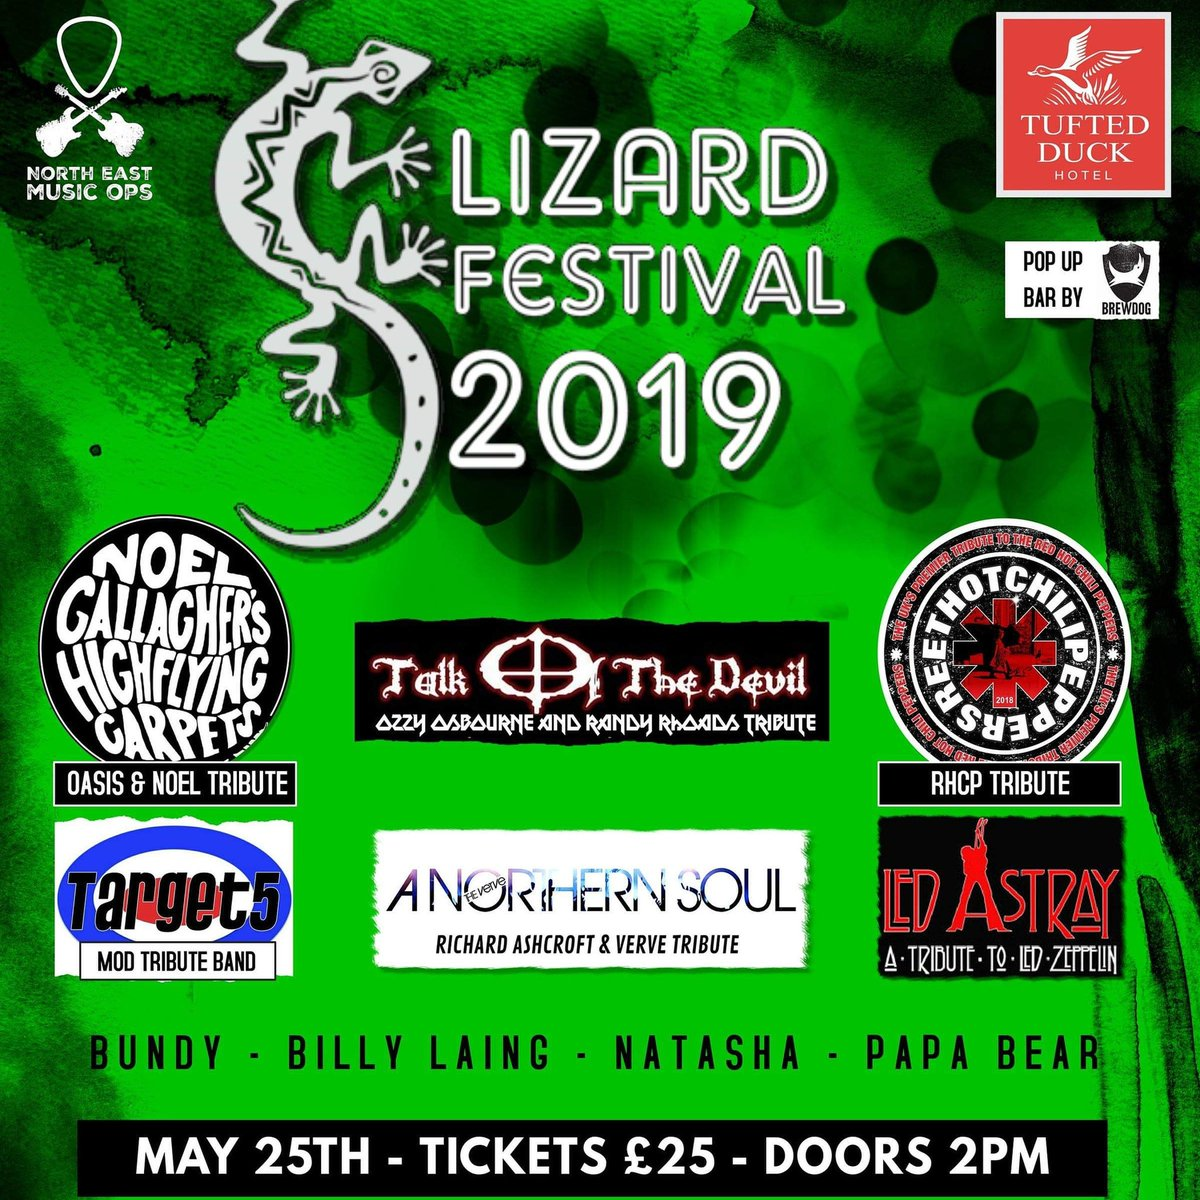 The Lizard Festival (@Lizardfestival) | Twitter